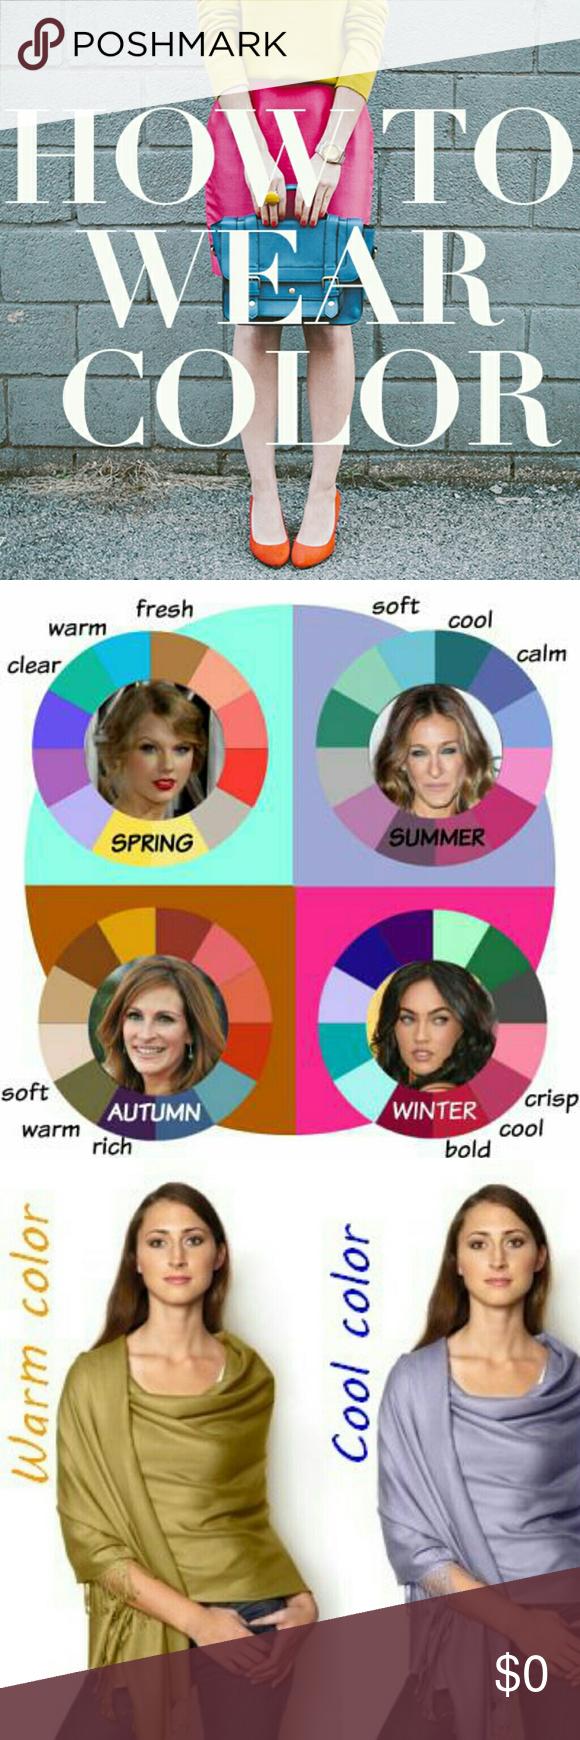 i am a winter what colors should i wear